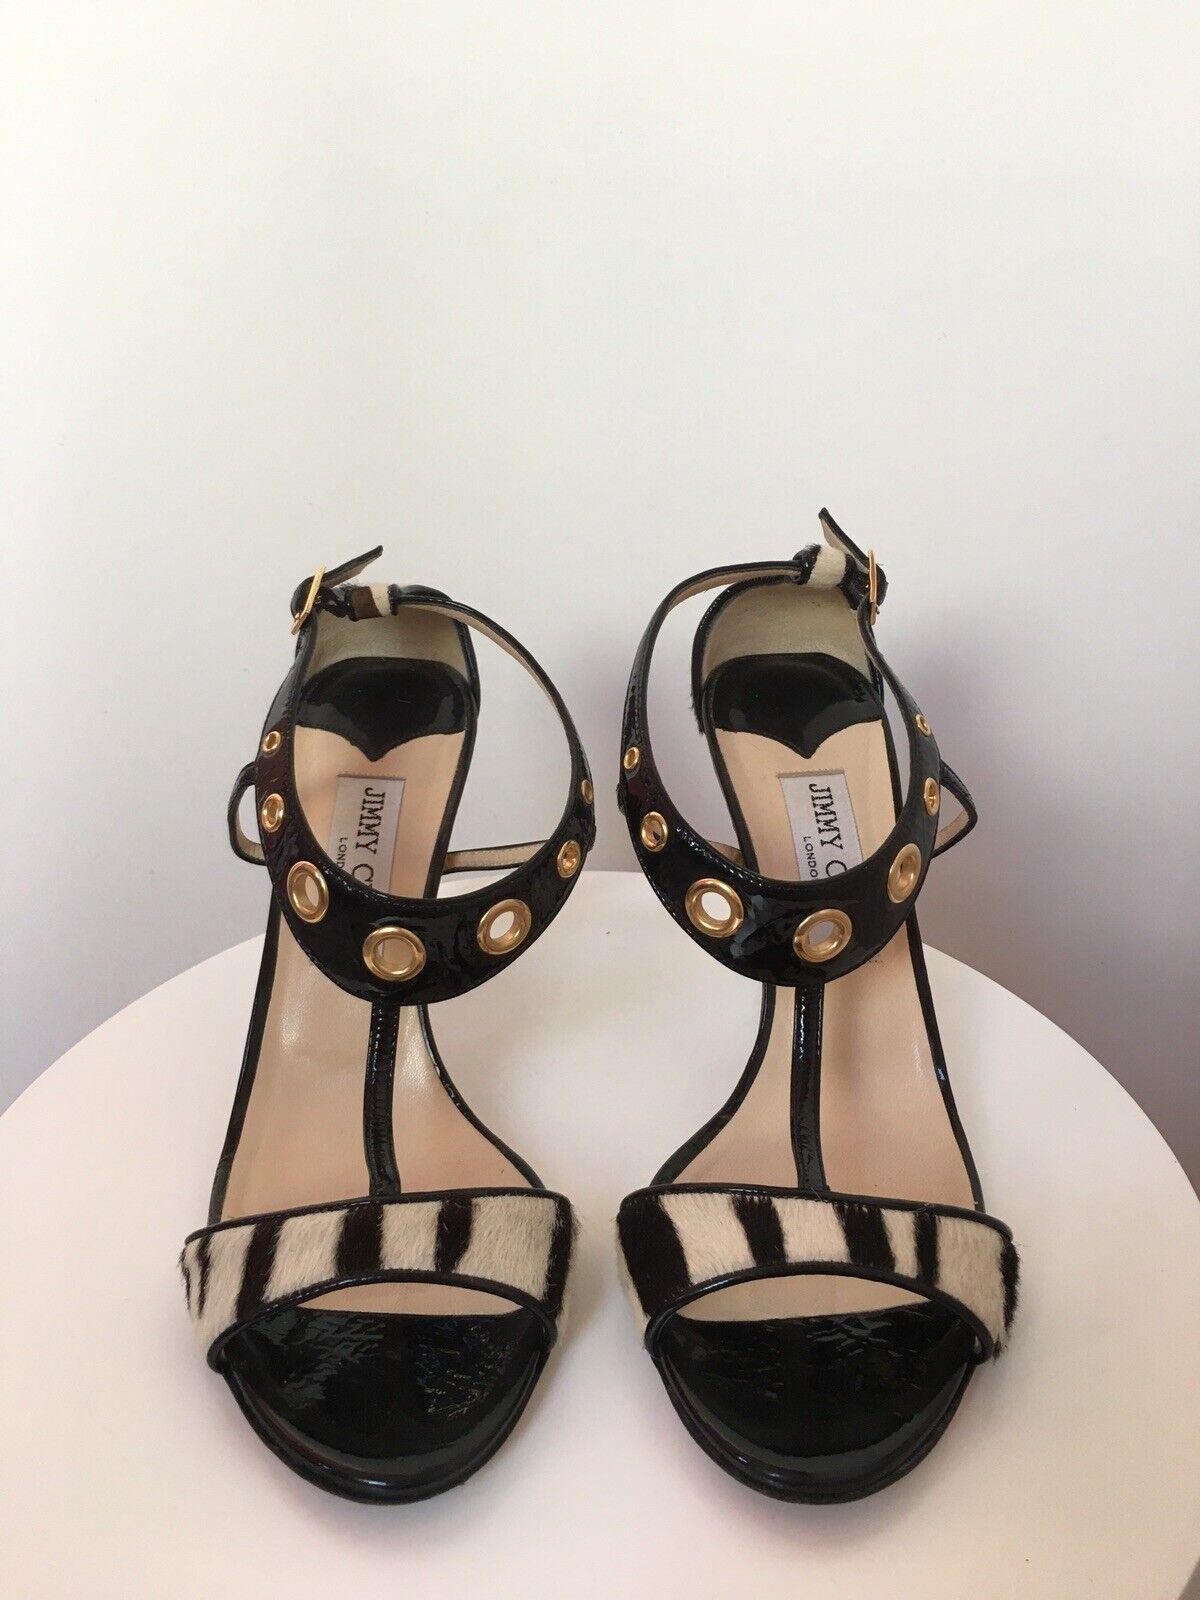 Jimmy Choo 85mm Zebra Pony Hair And Black Patent Leather Stiletto Sandals 38.5